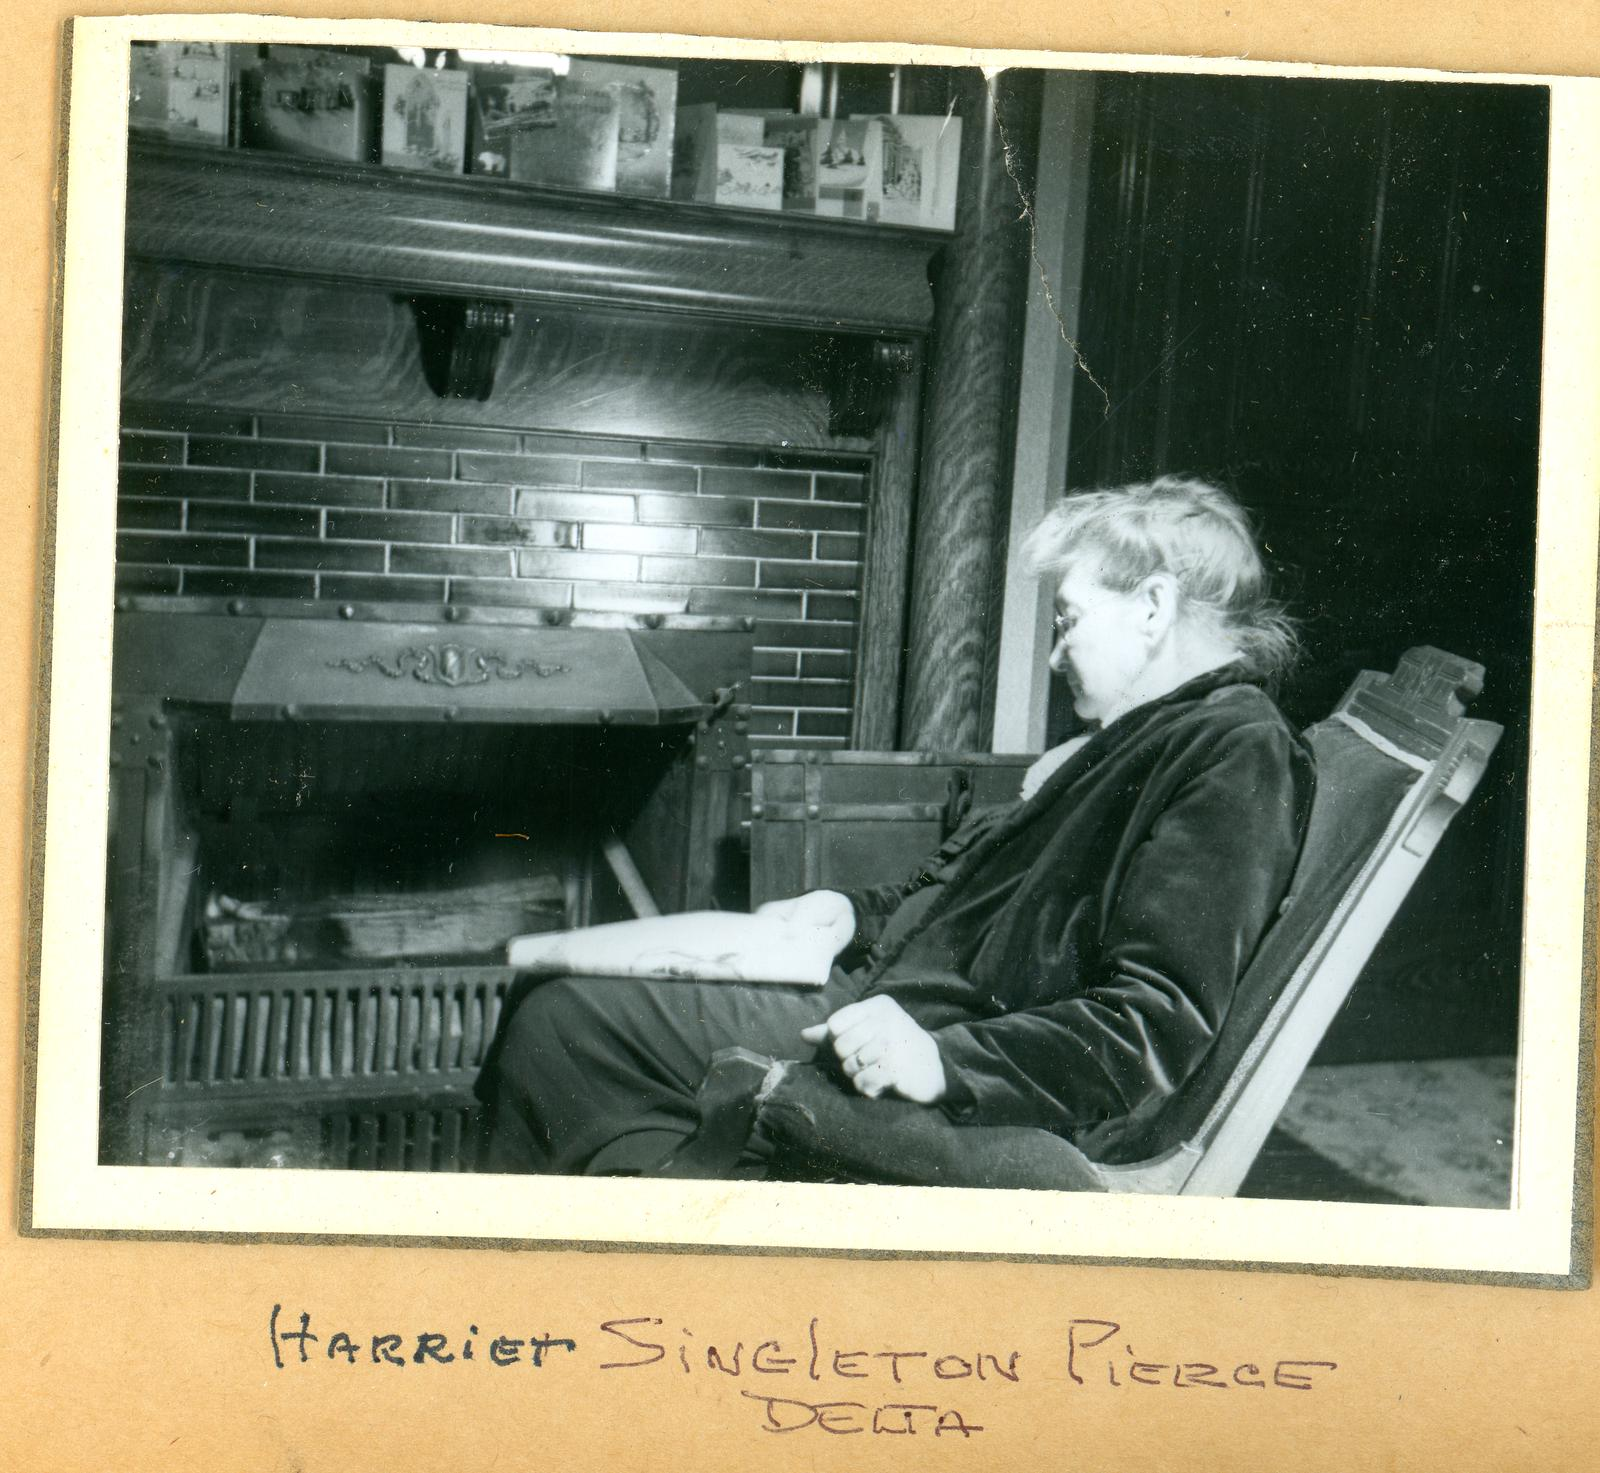 Harriet Singleton Pierce c.1935